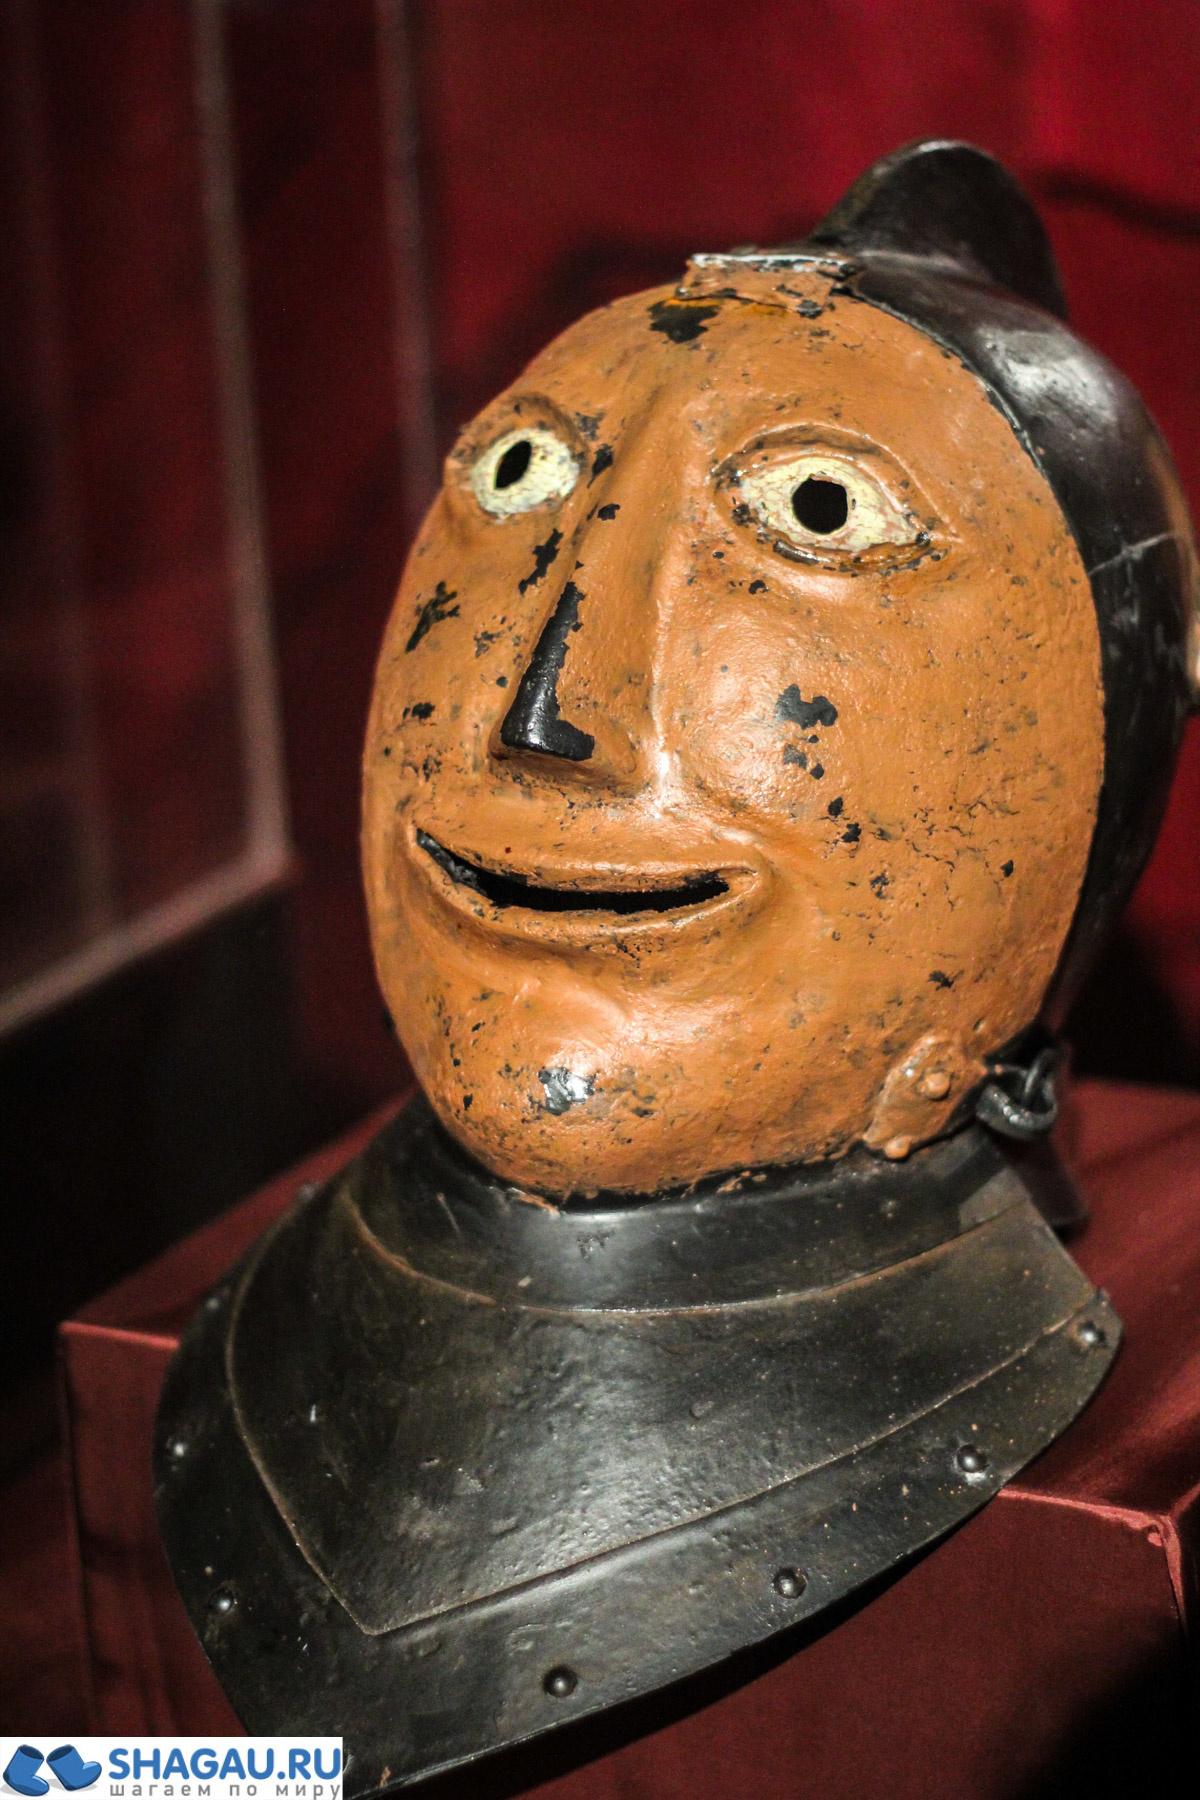 Музей пыток в Праге   1800x1200